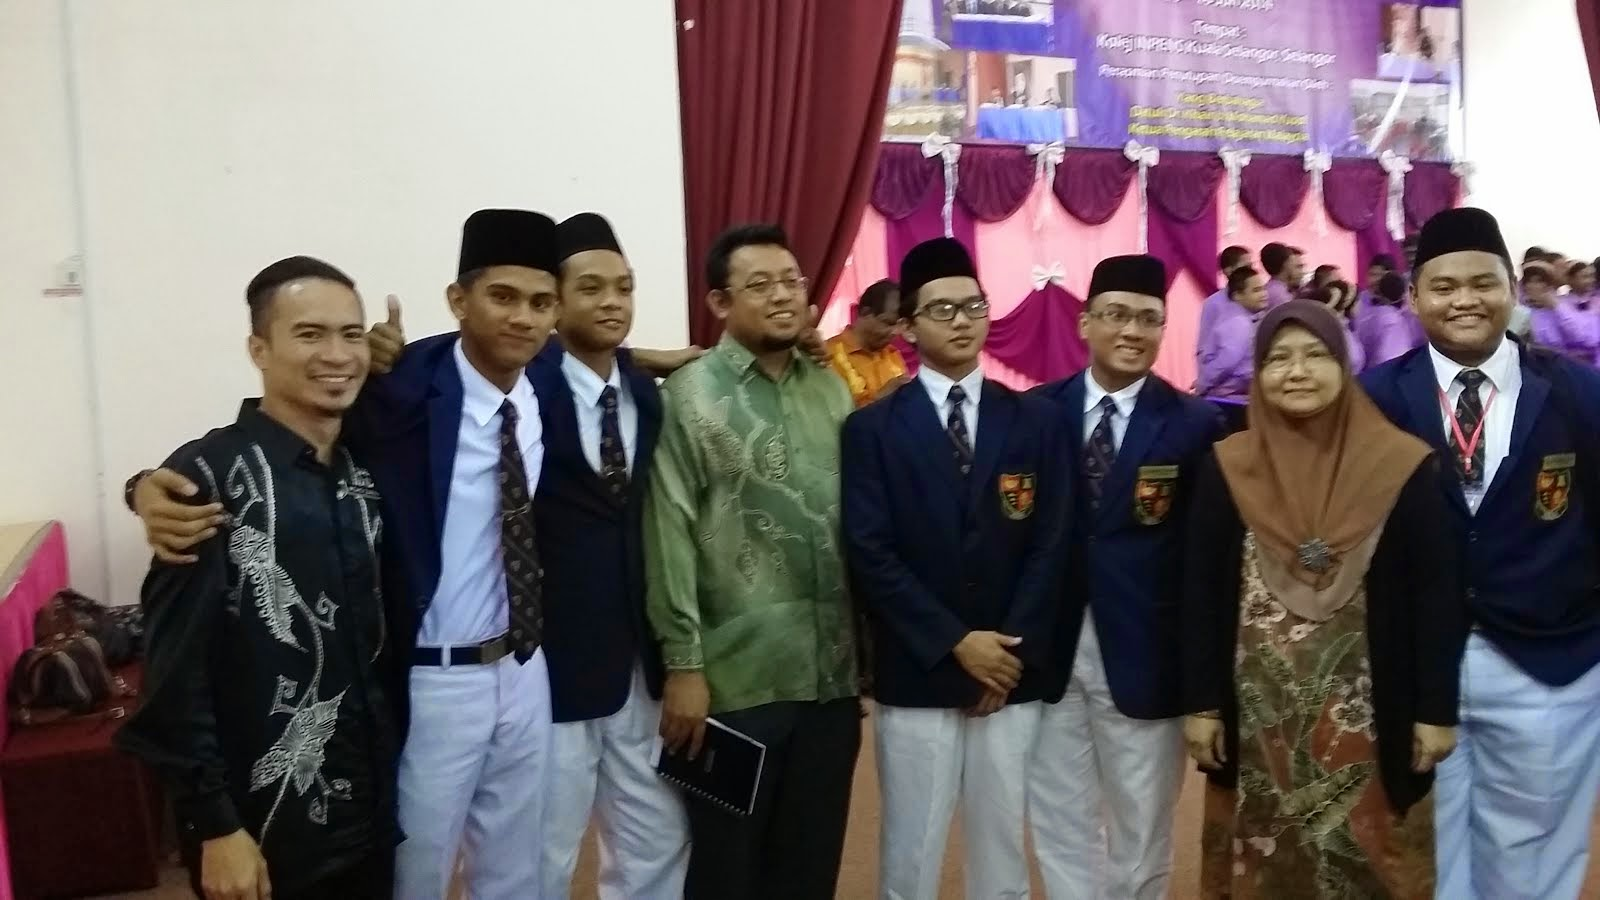 Bahas Bahasa Melayu Ala Parlimen Peringkat Kebangsaan 2014